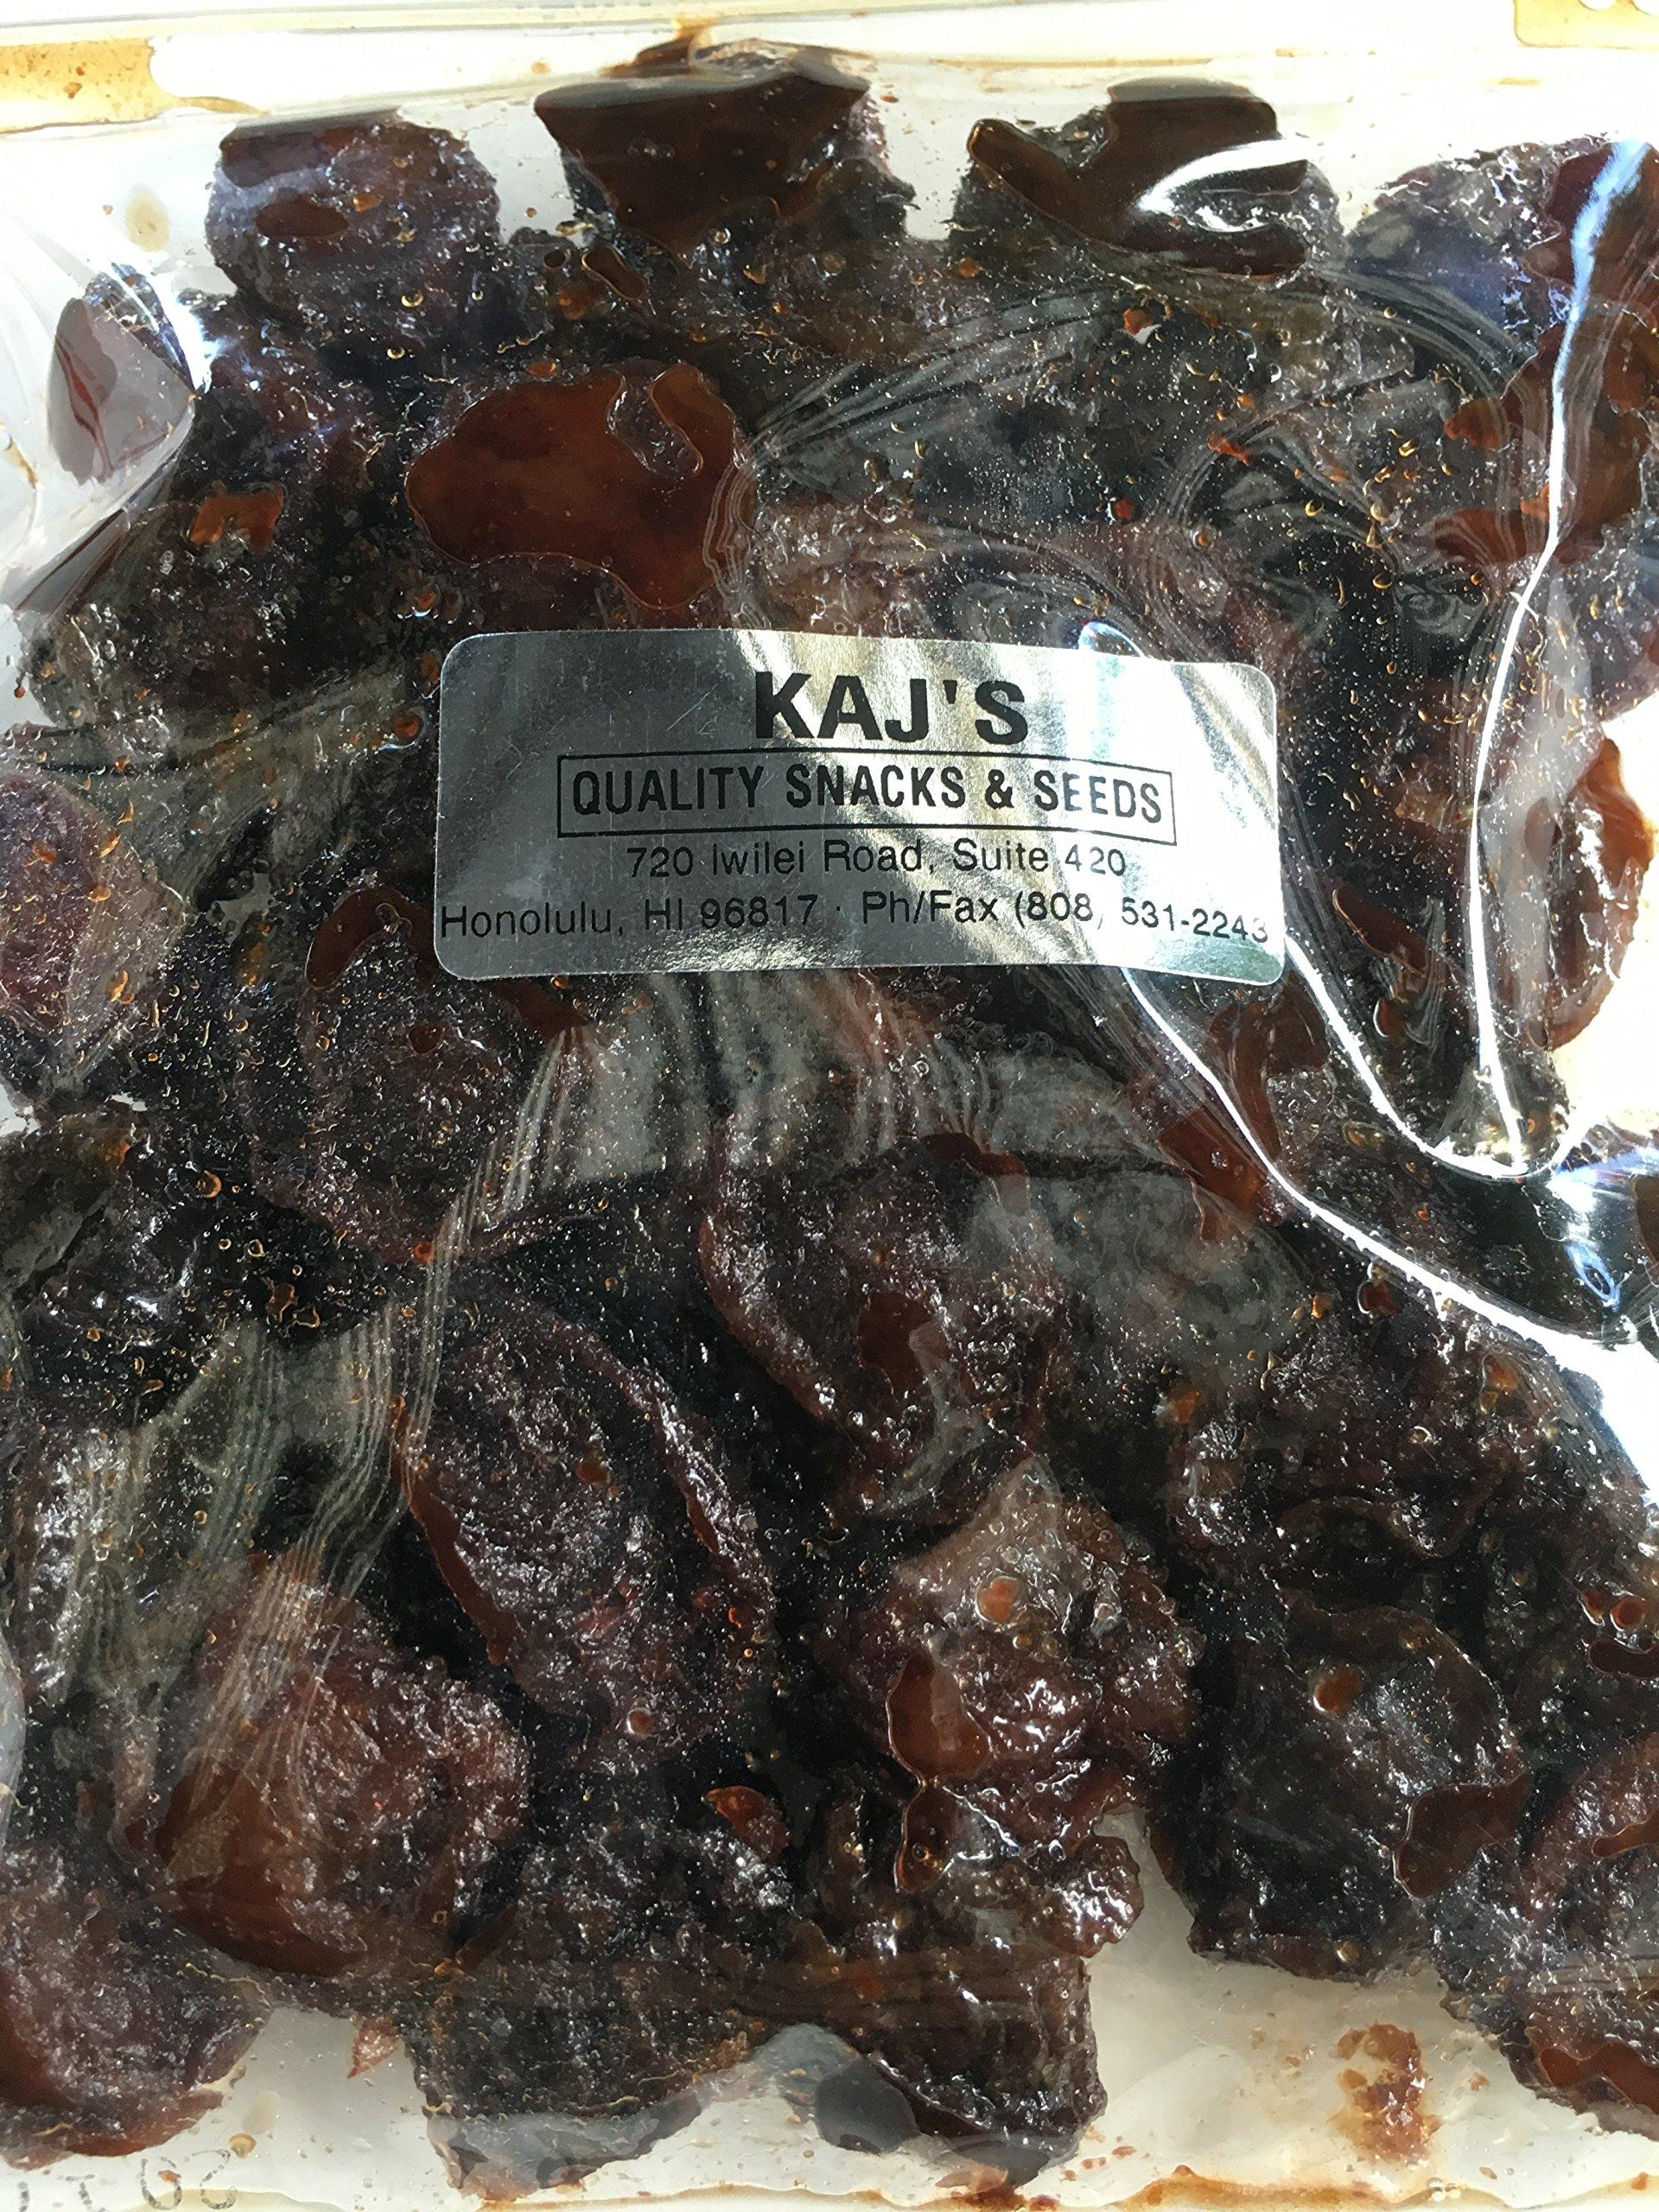 Kaj's Rock Salt Plum Wet Li Hing Mui Dried Preserved Plums 8 Ounces by KAJ's Quality Snacks and Seeds